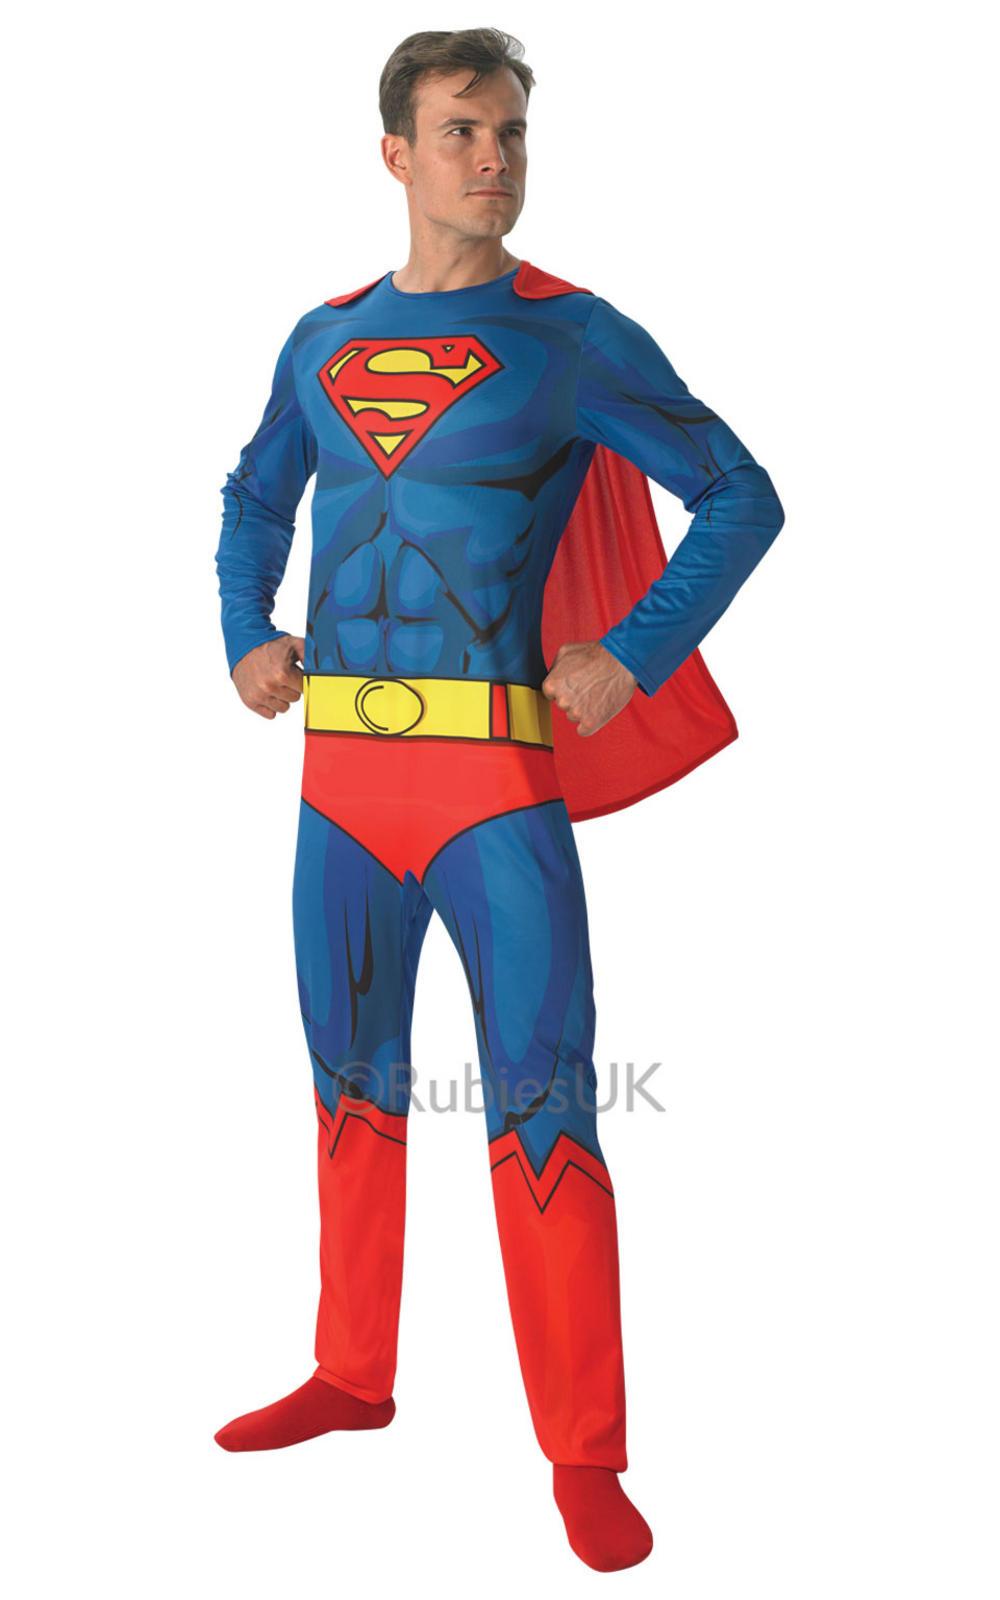 Comic Book Superman Costume